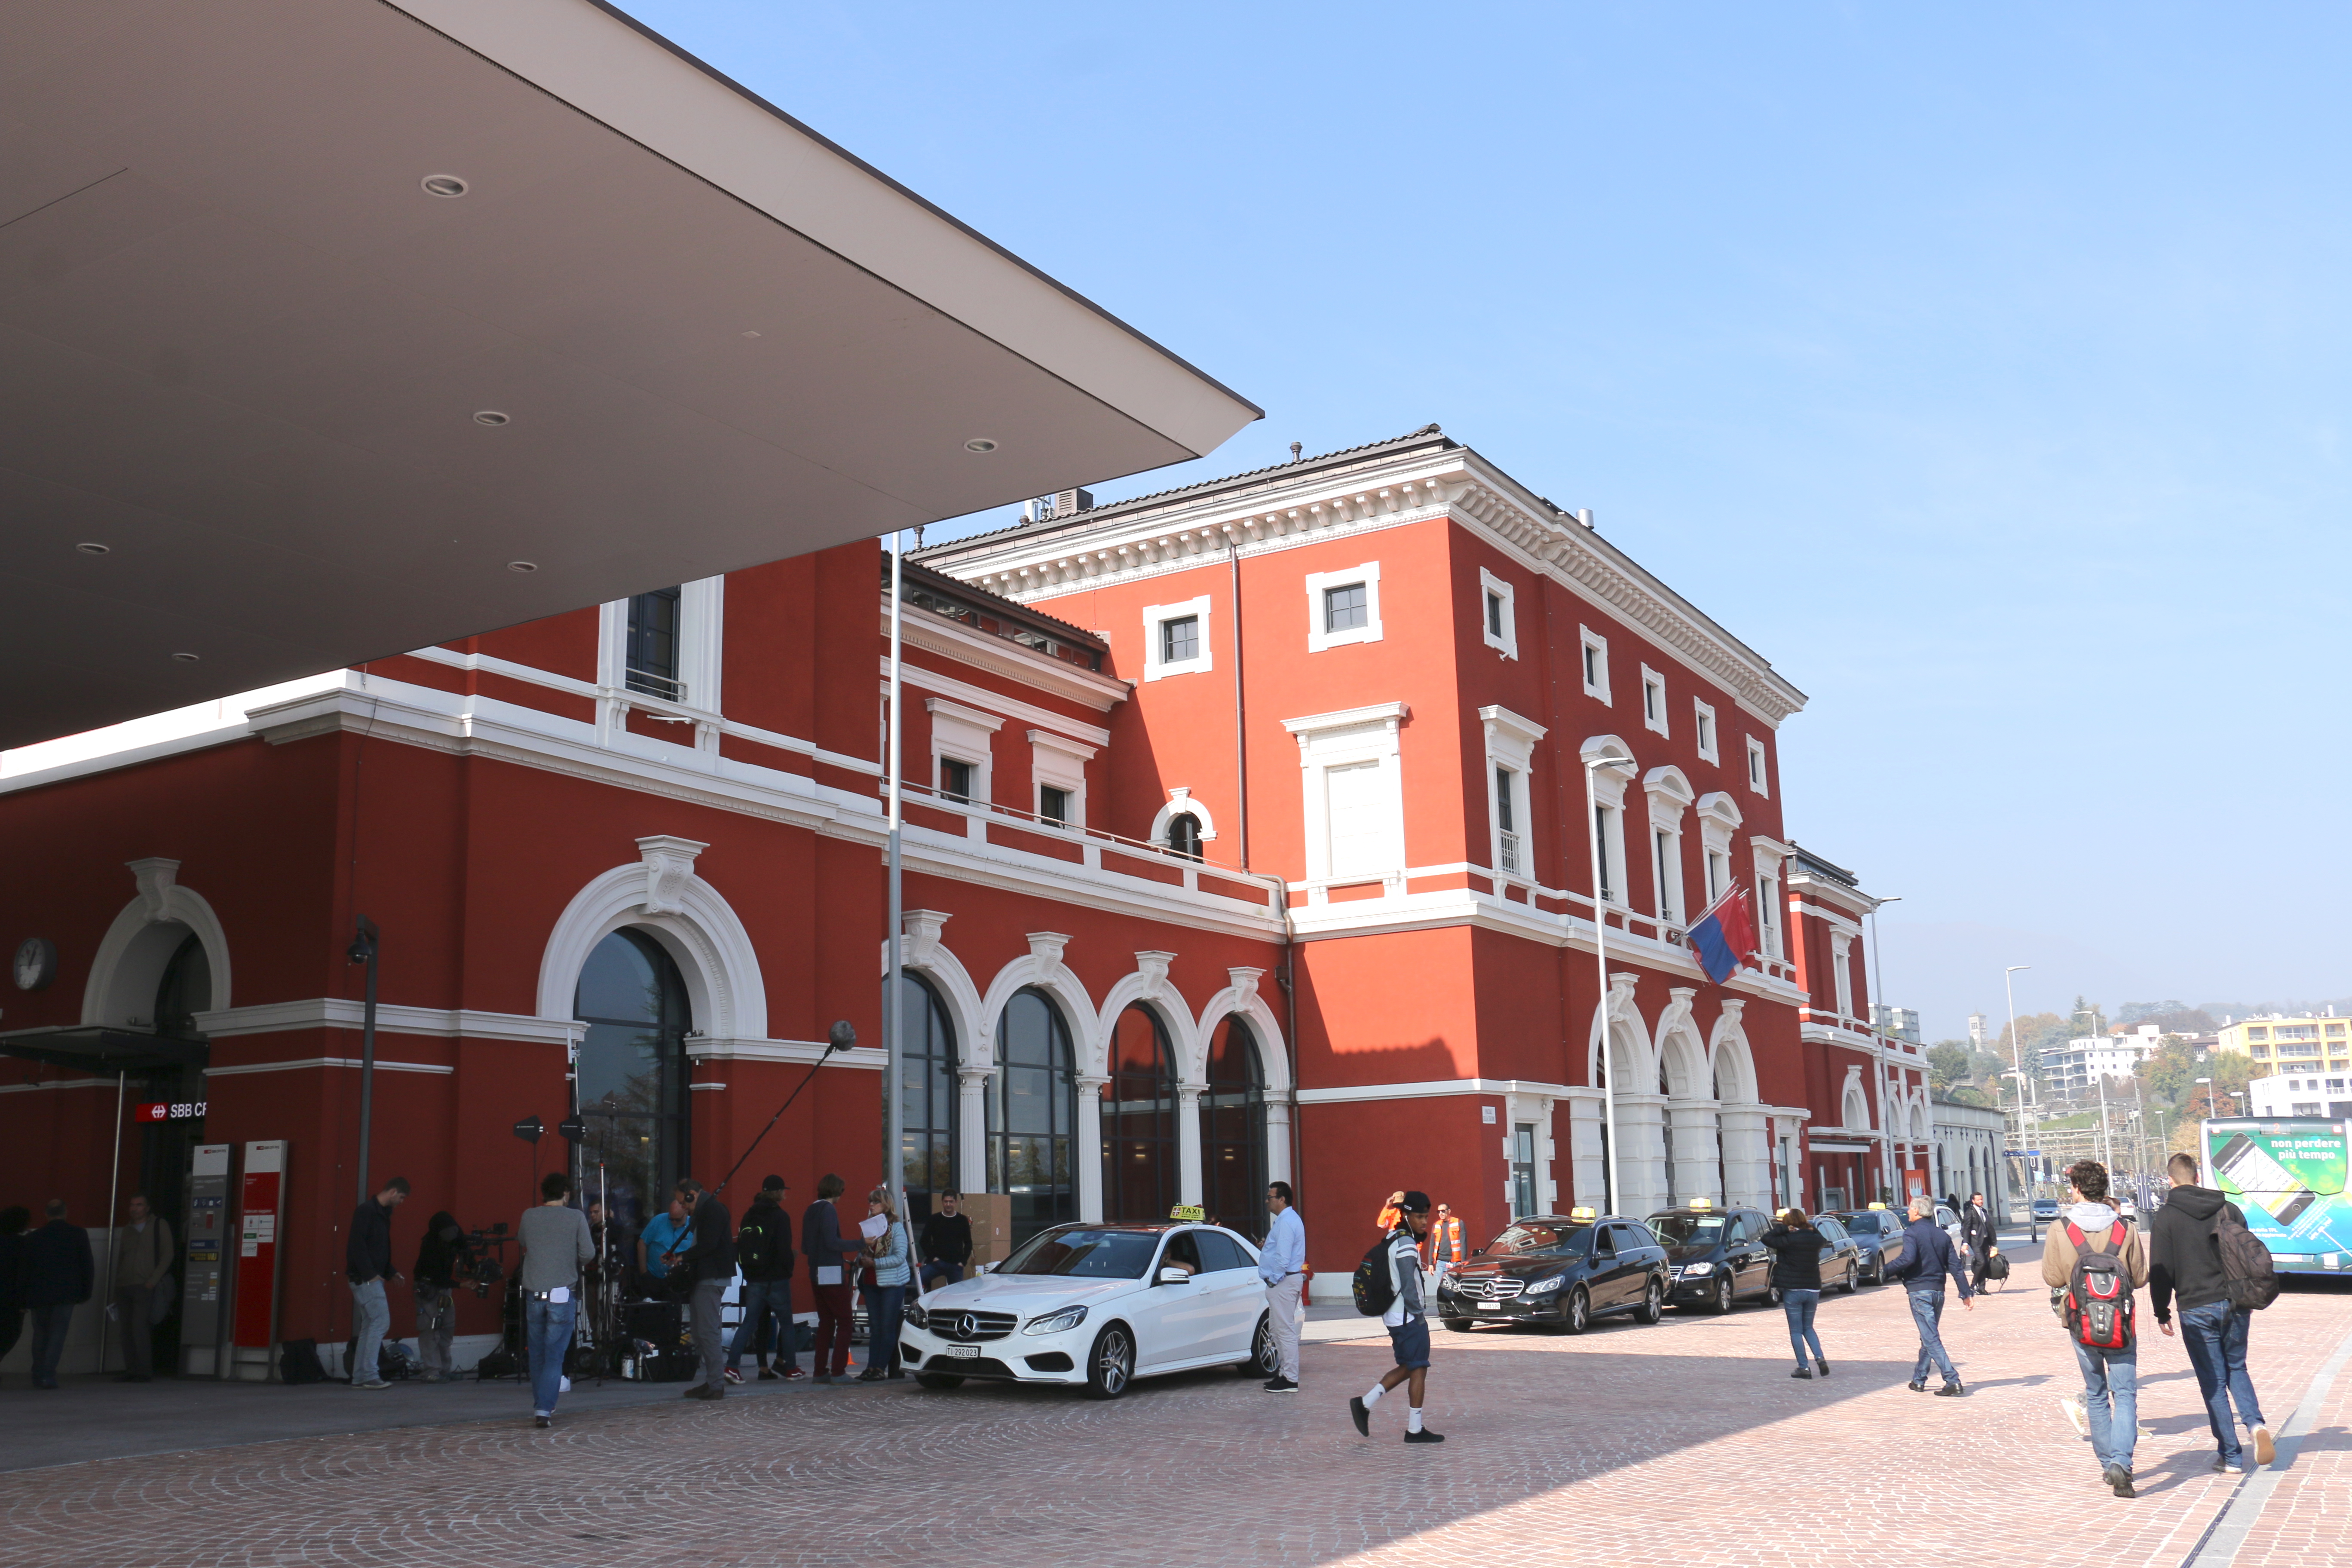 Bahnhof Lugano 2017